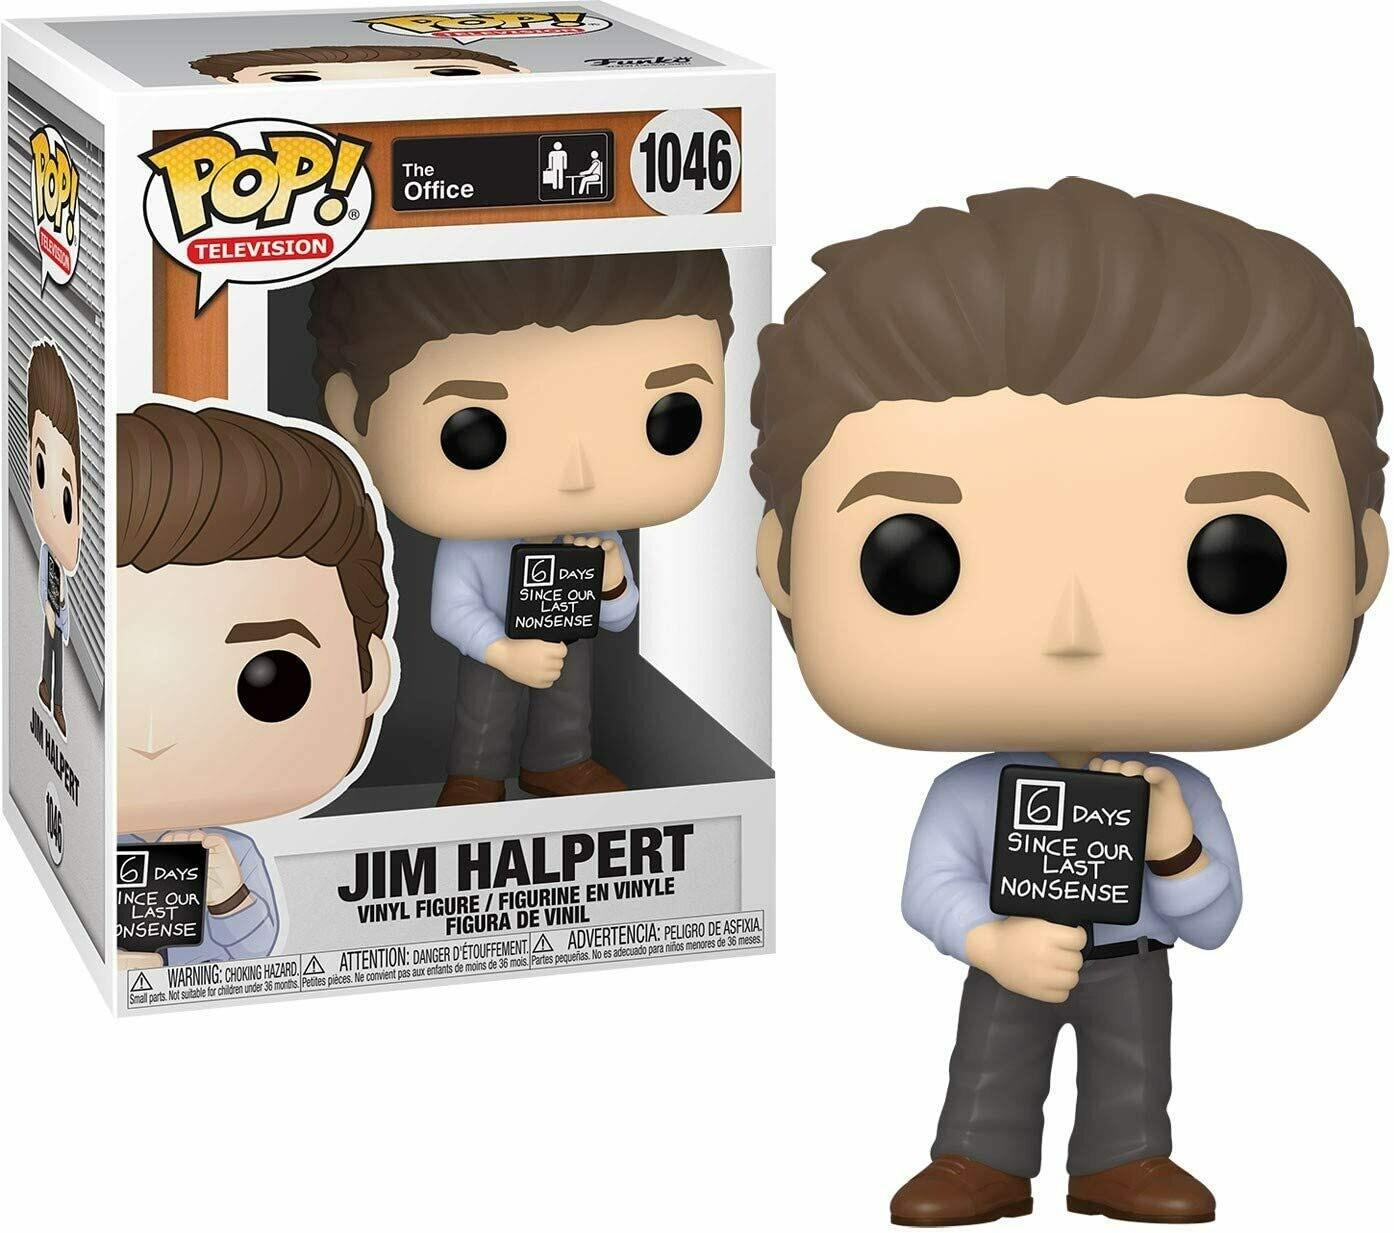 Funko Pop! Jim Halpert #1046 - The Office